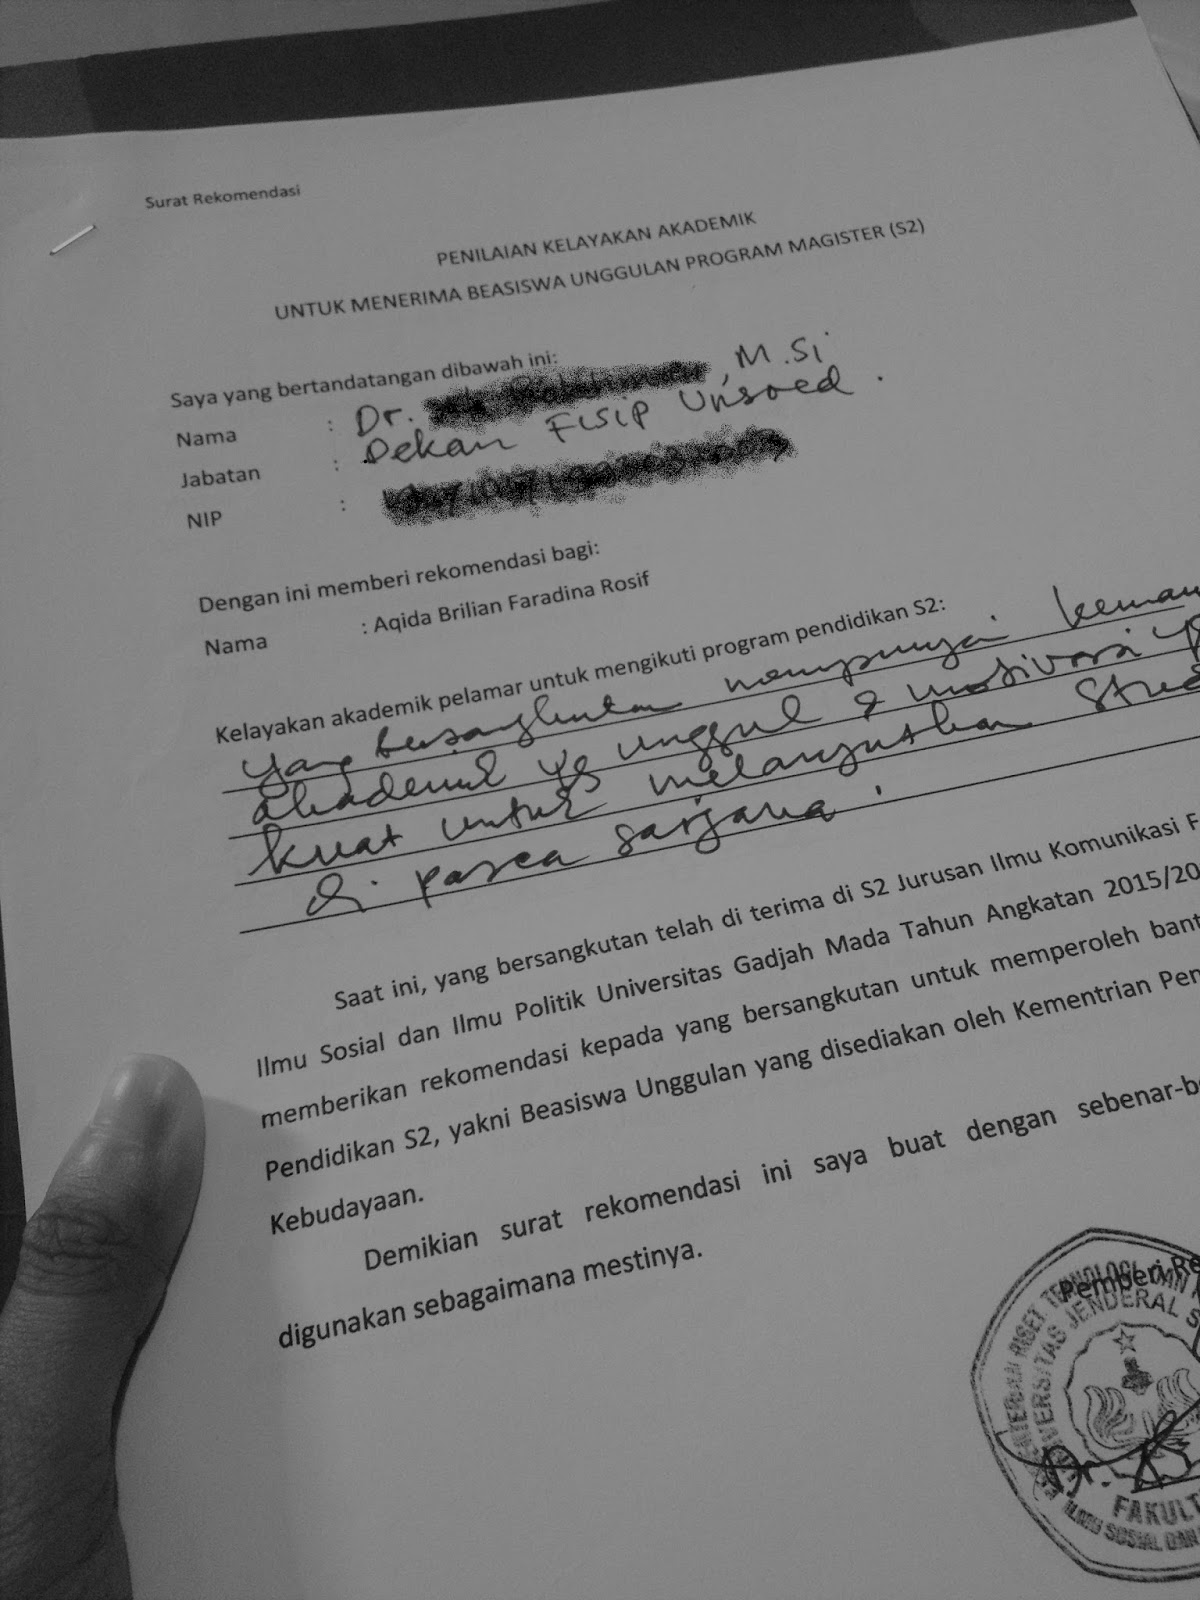 faradina contoh surat rekomendasi untuk melamar s2 dan beasiswa